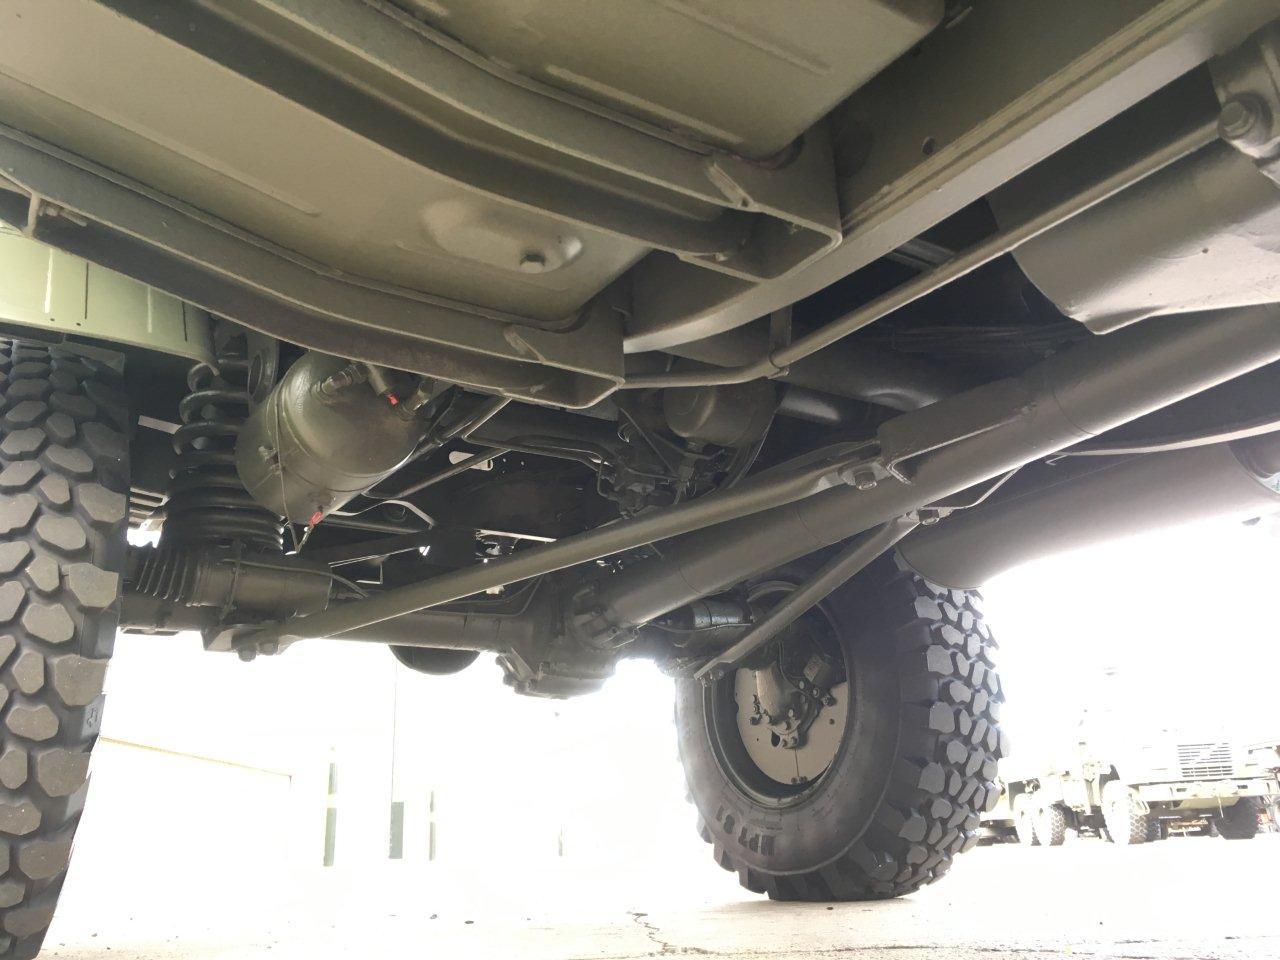 Mercedes Benz Unimog U1300L 4x4 Medical Ambulance | used military vehicles, MOD surplus for sale